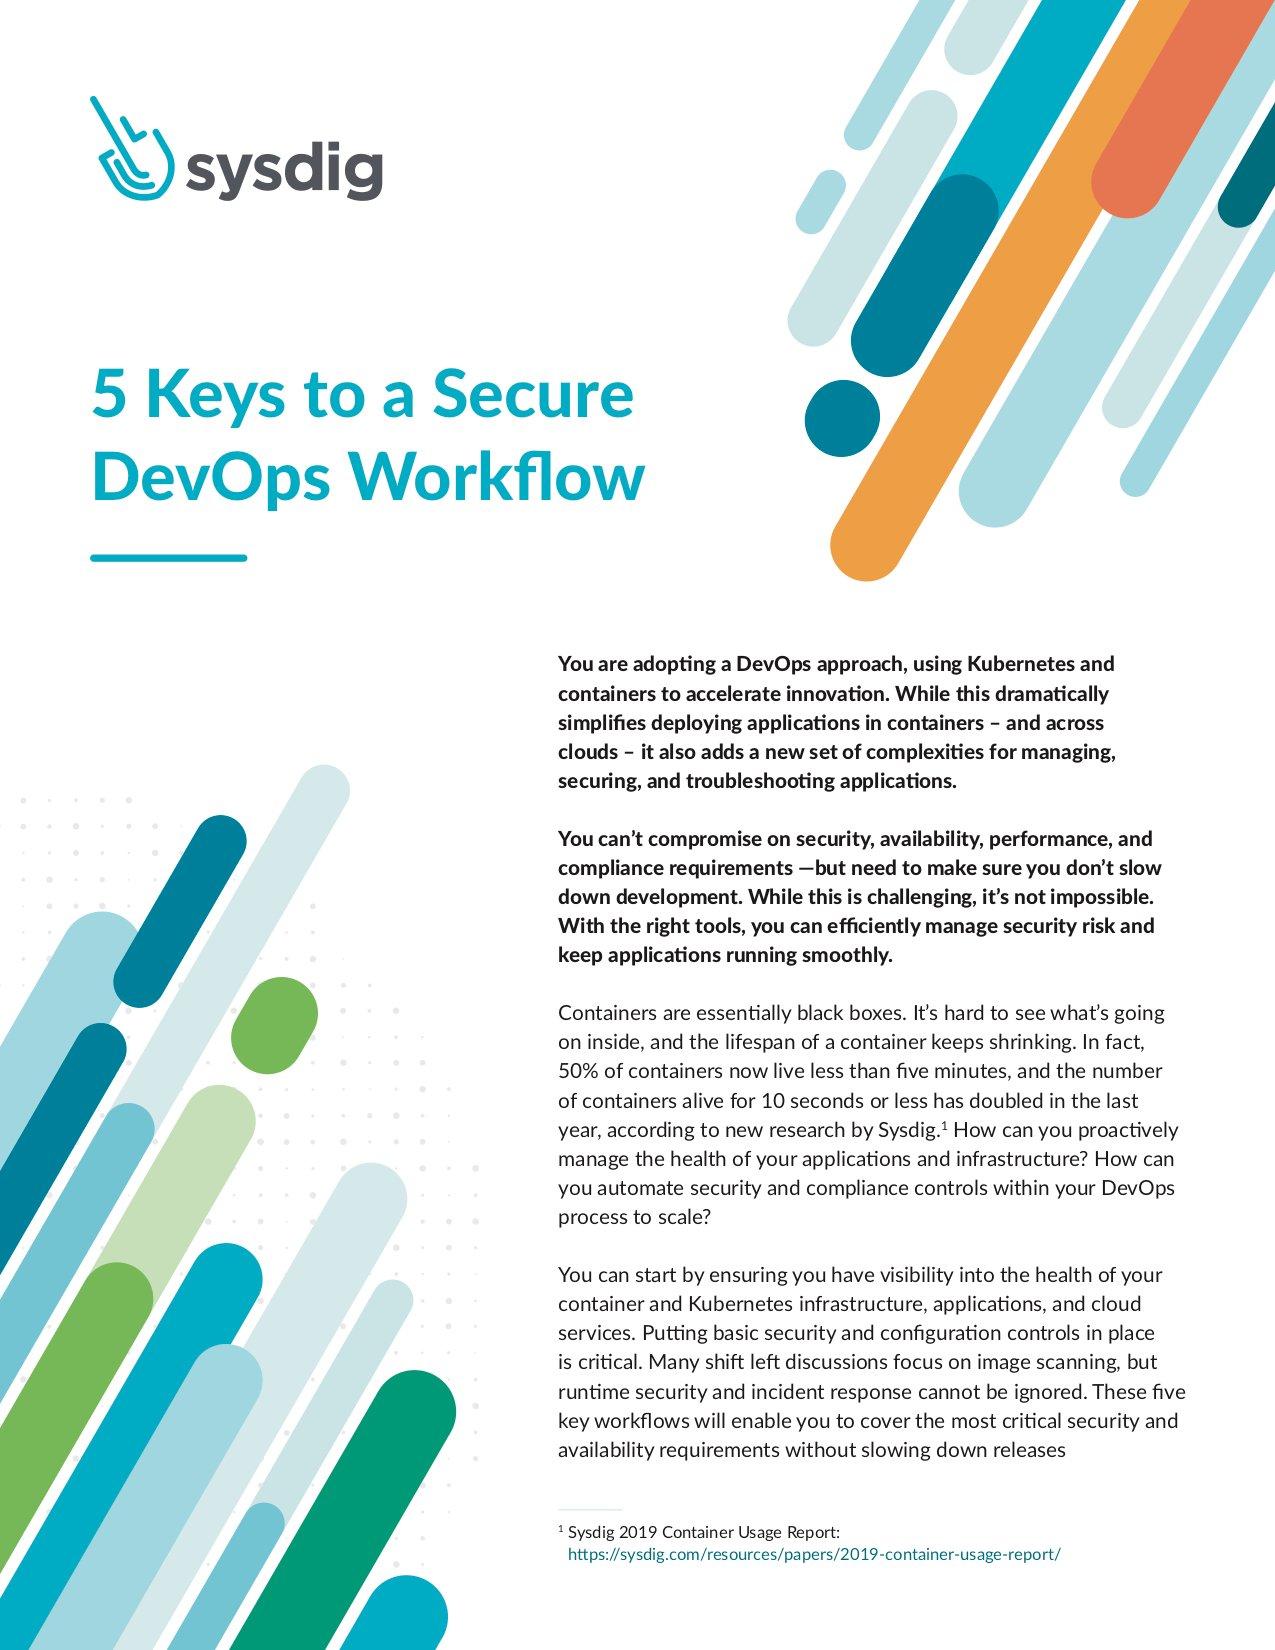 5 Keys to a Secure DevOps Workflow_cover